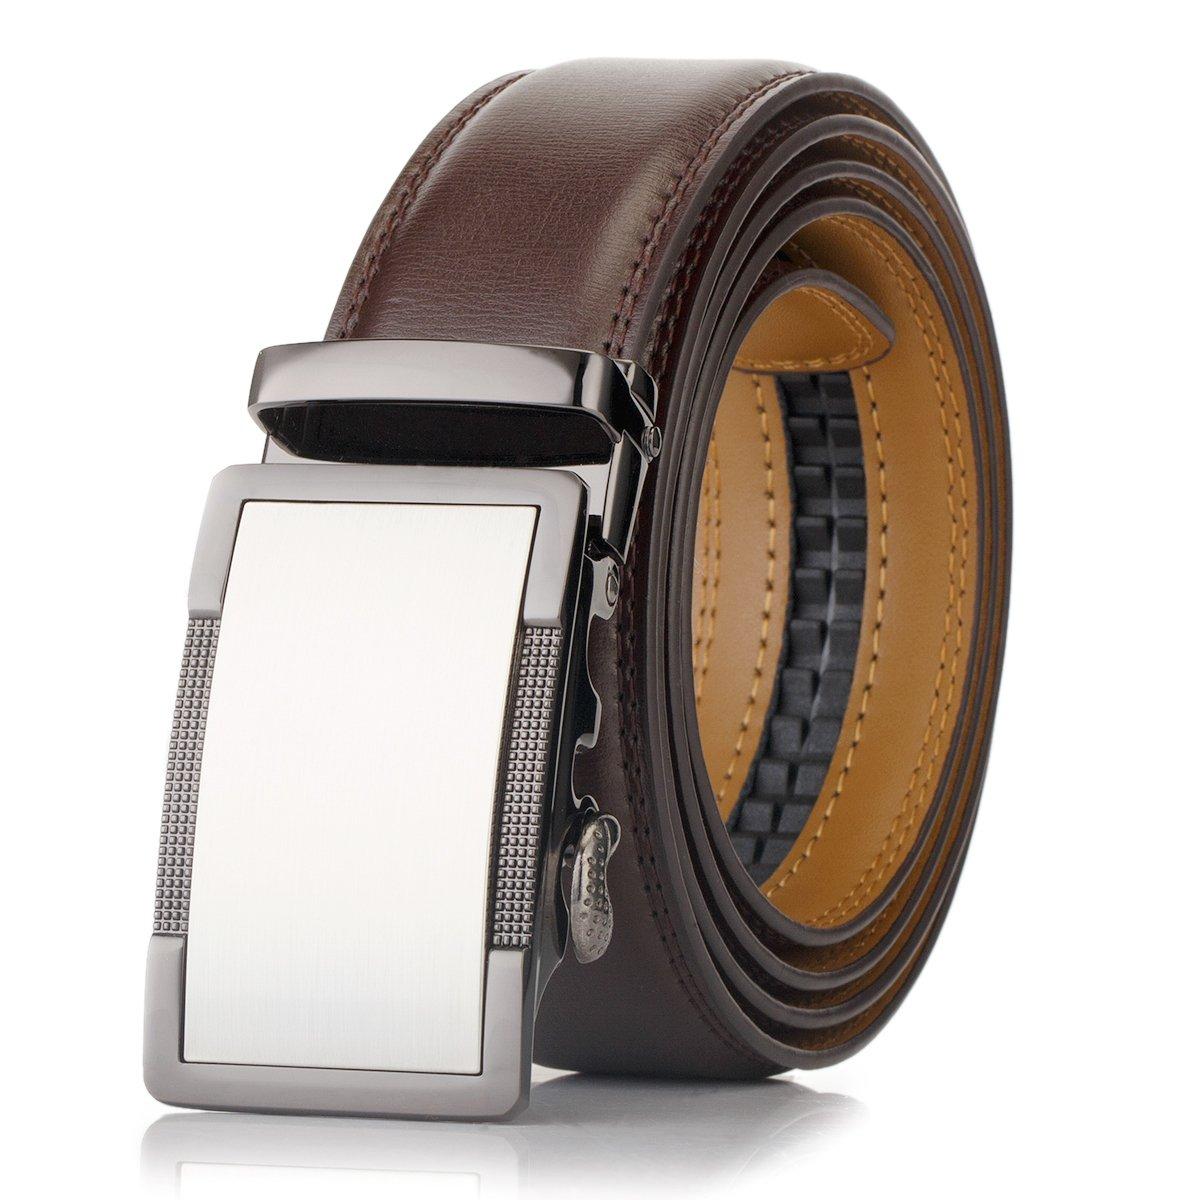 OKOKO men's Ratchet buckle genuine leather belt 35MM width (M~L:up to 44'' waist, buckle 4+brown leather)